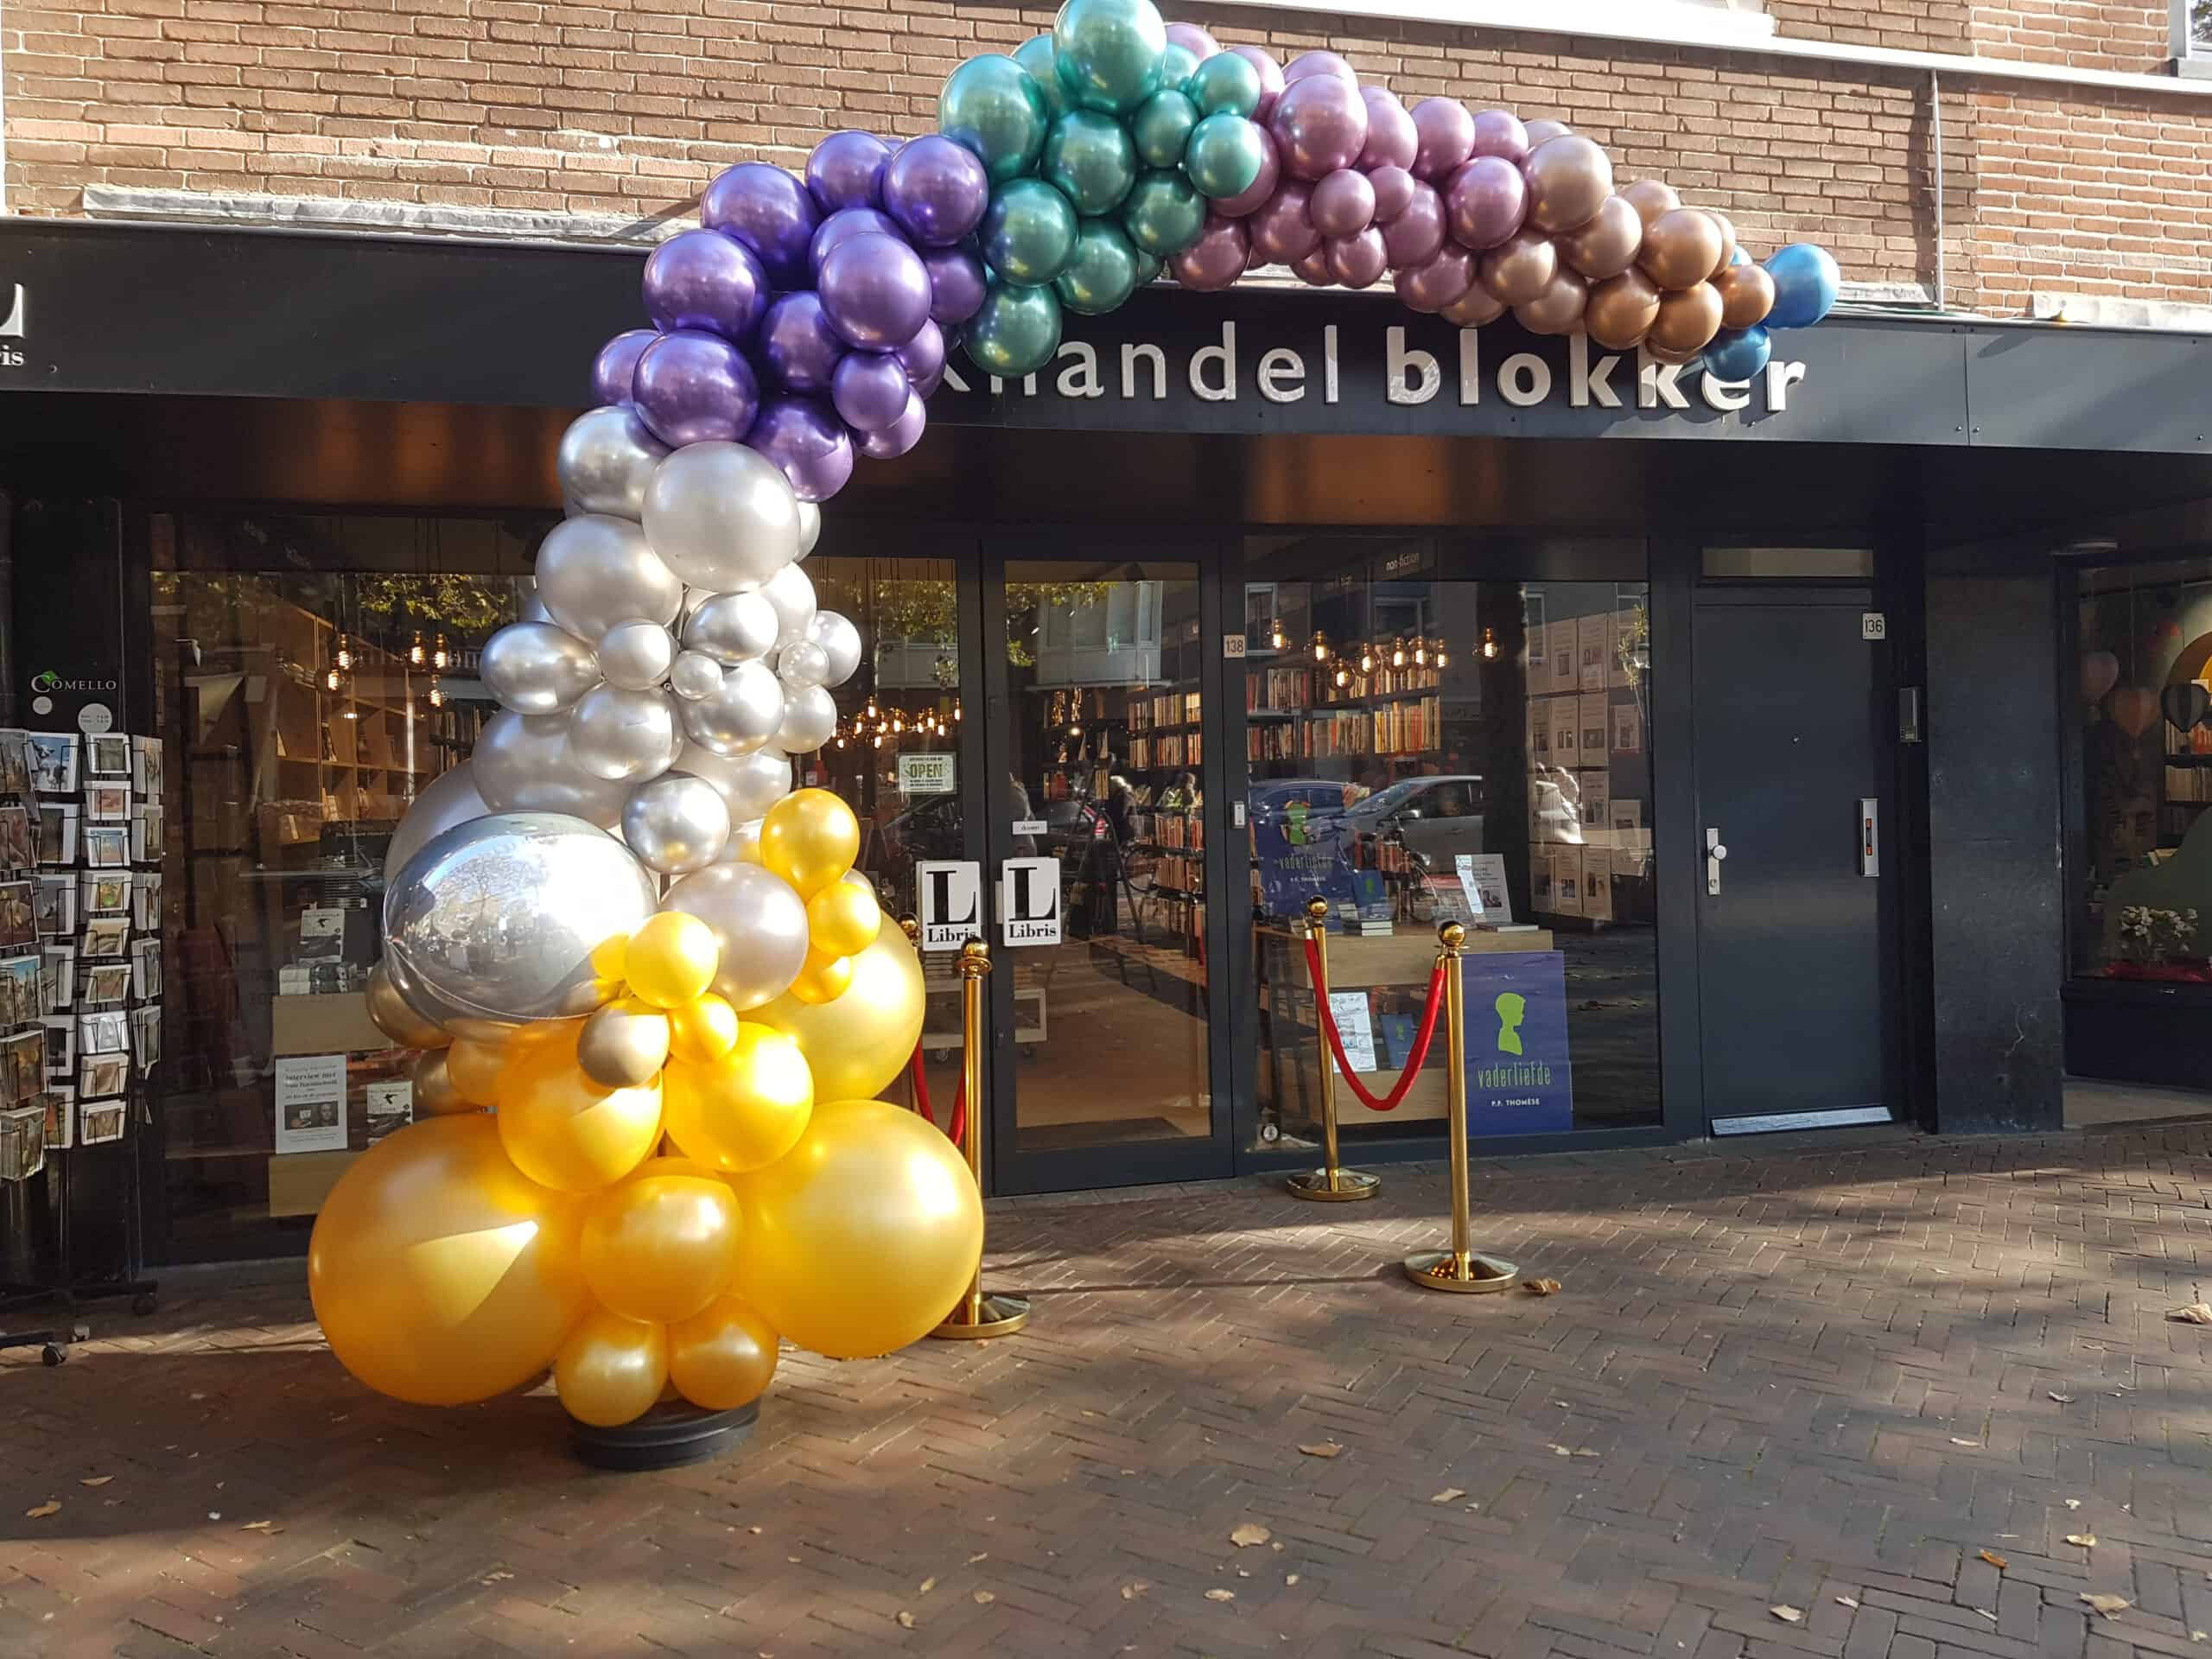 20191031 121523 scaled - Organic ballondecoratie van allerlei maten ballonnen